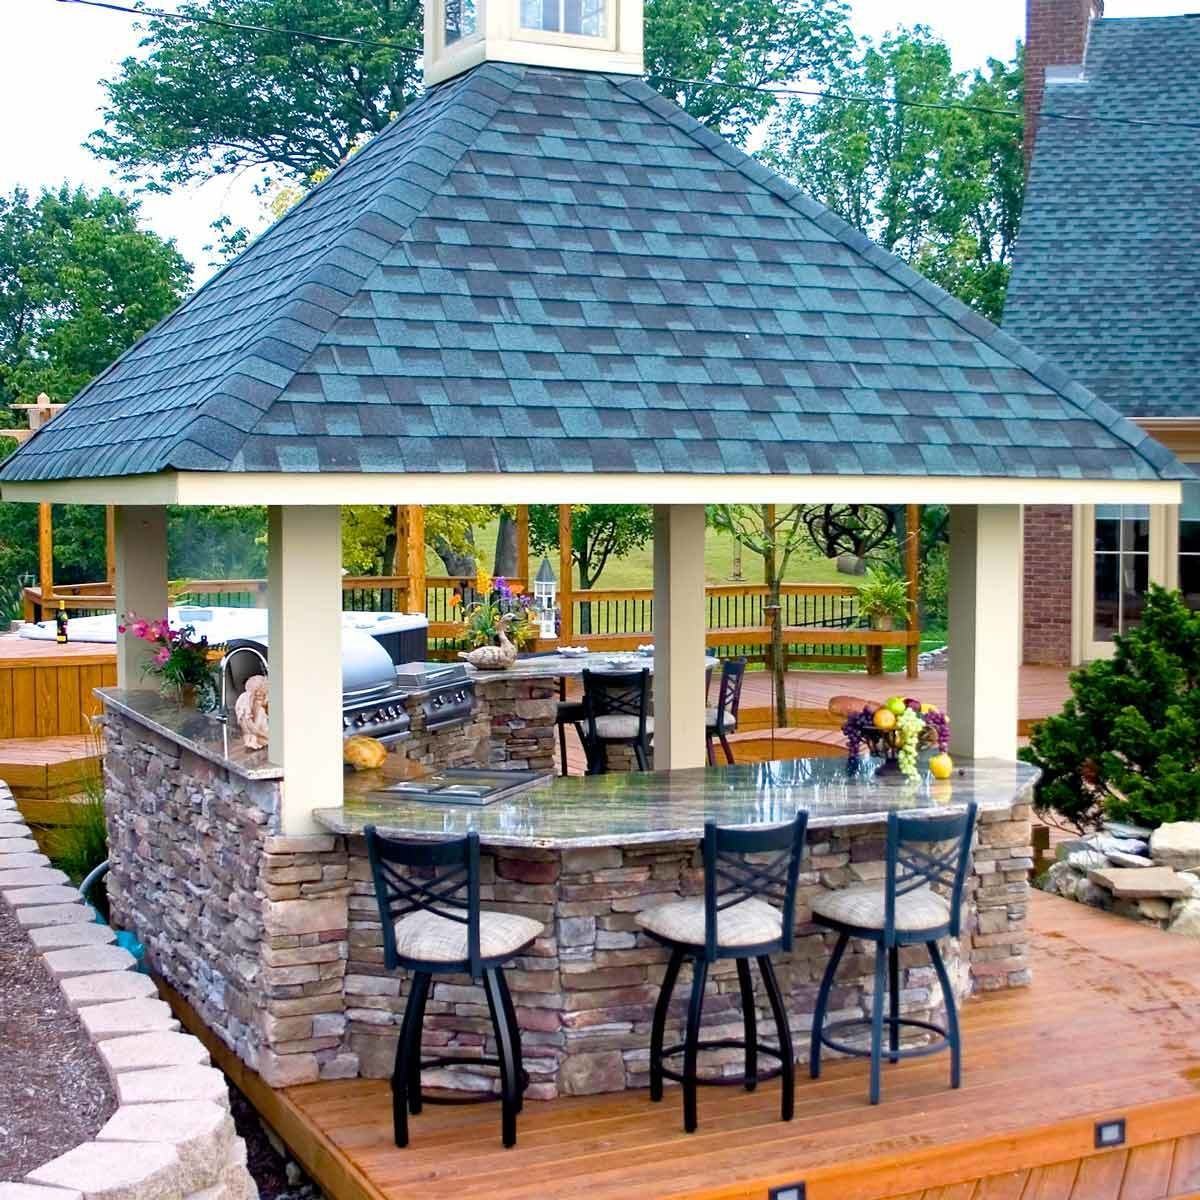 10 inspiring outdoor bar ideas outdoor kitchen design